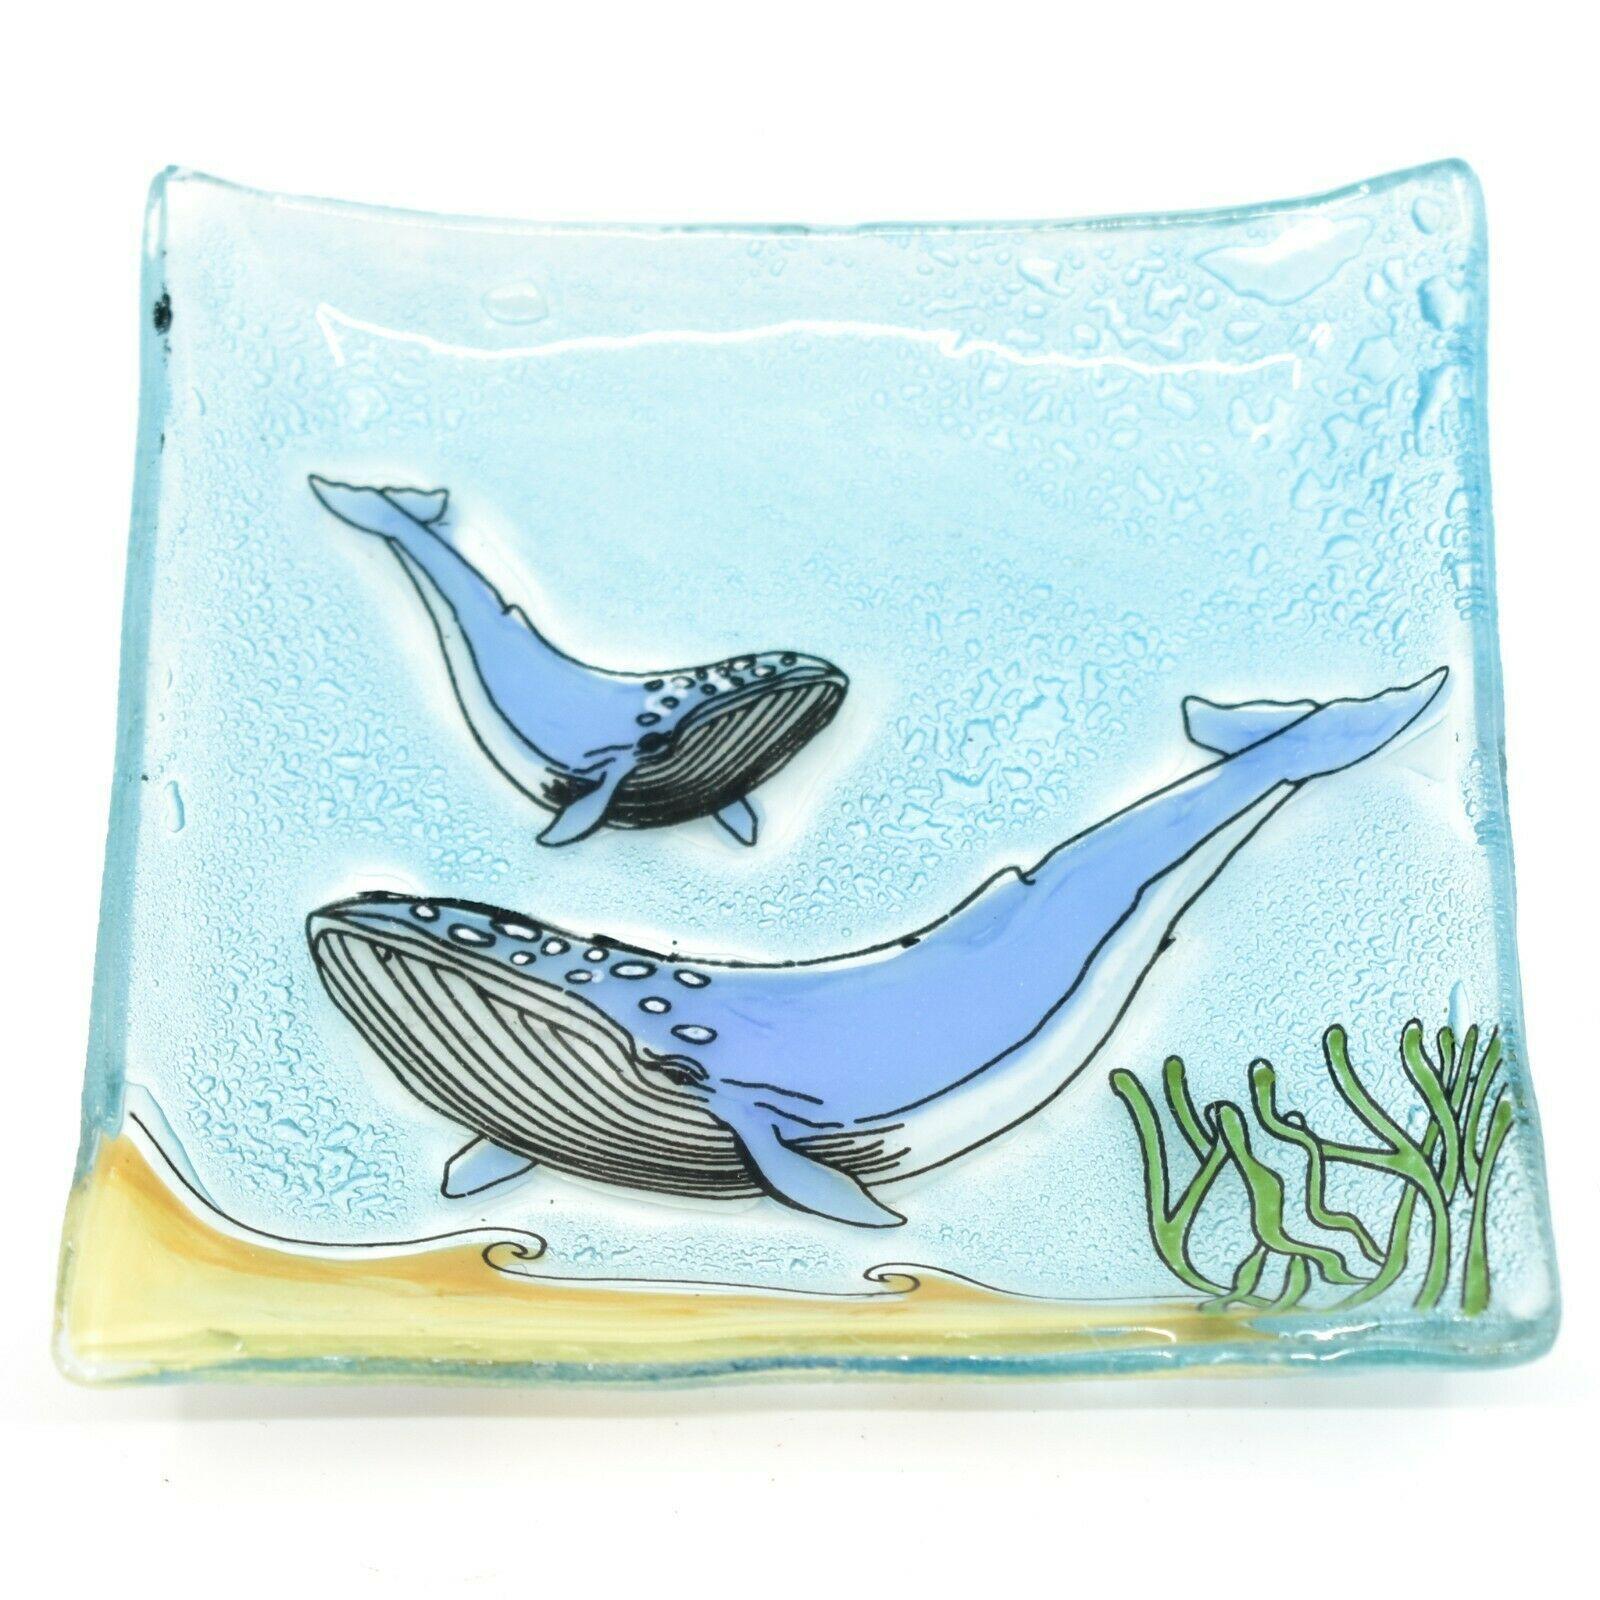 Fused Art Glass Ocean Humpback Whale Design Square Soap Dish Handmade Ecuador